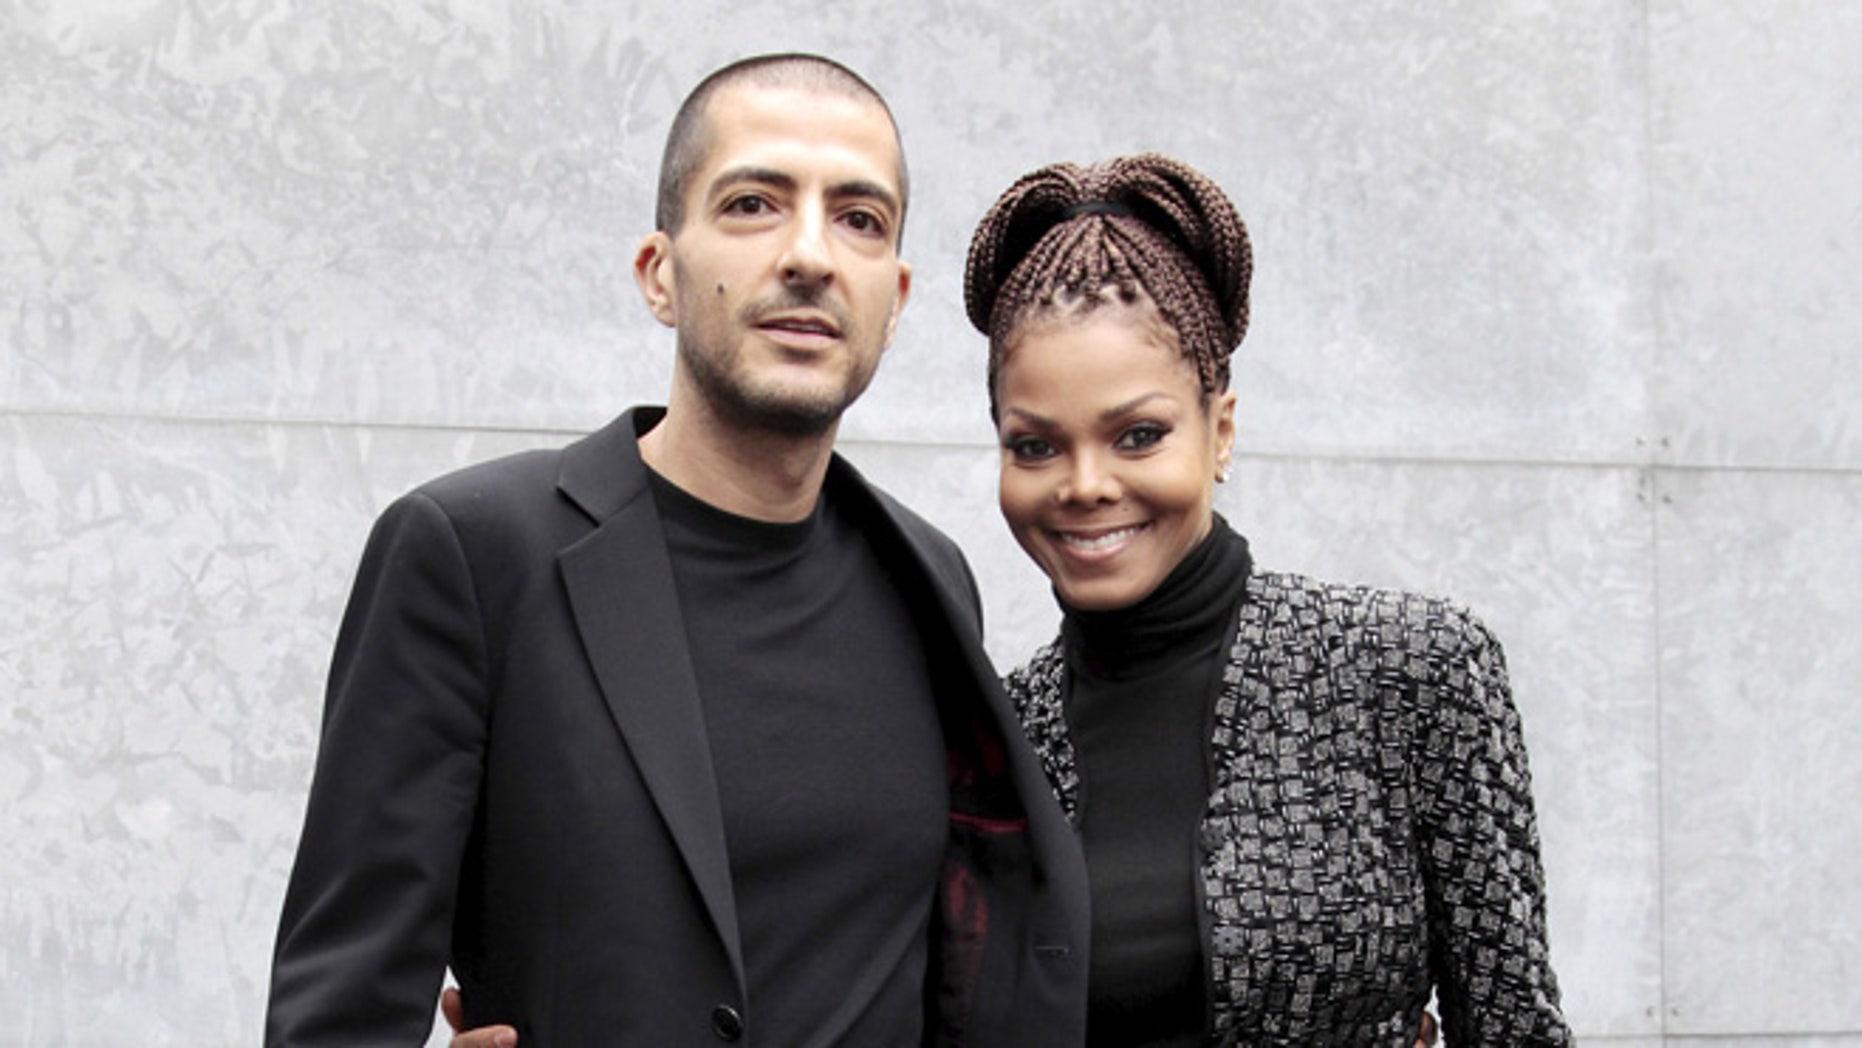 Janet Jackson has split from her husband Wissam Al Mana.